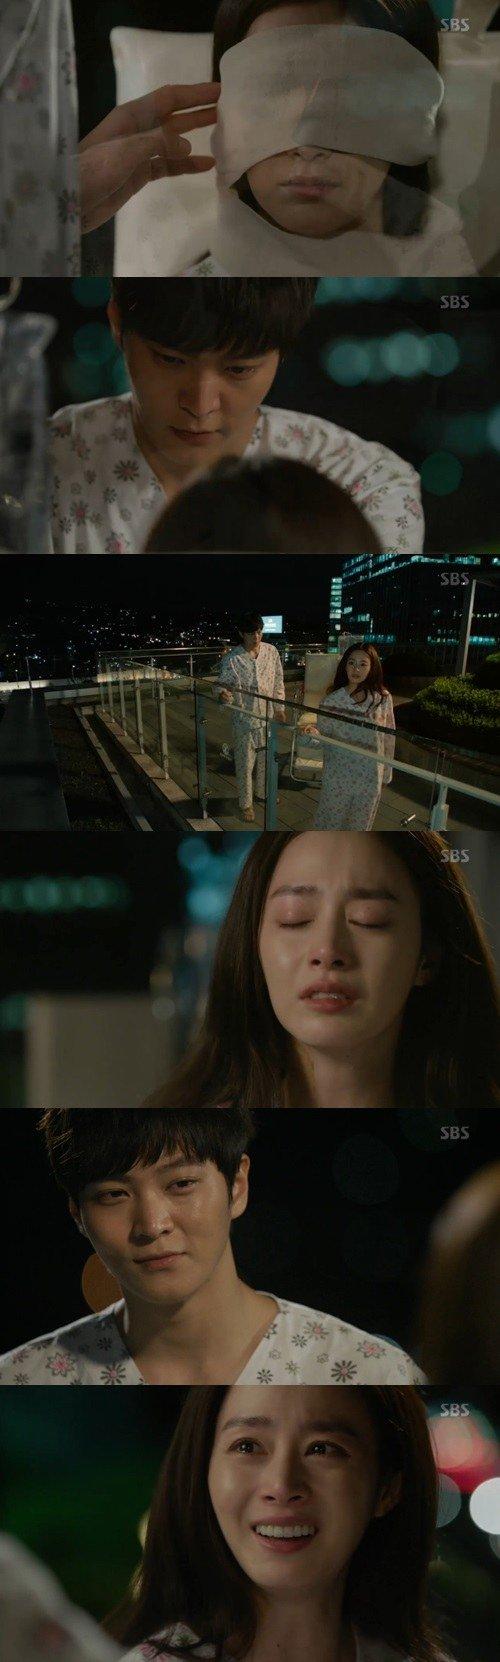 Pal and dating korean